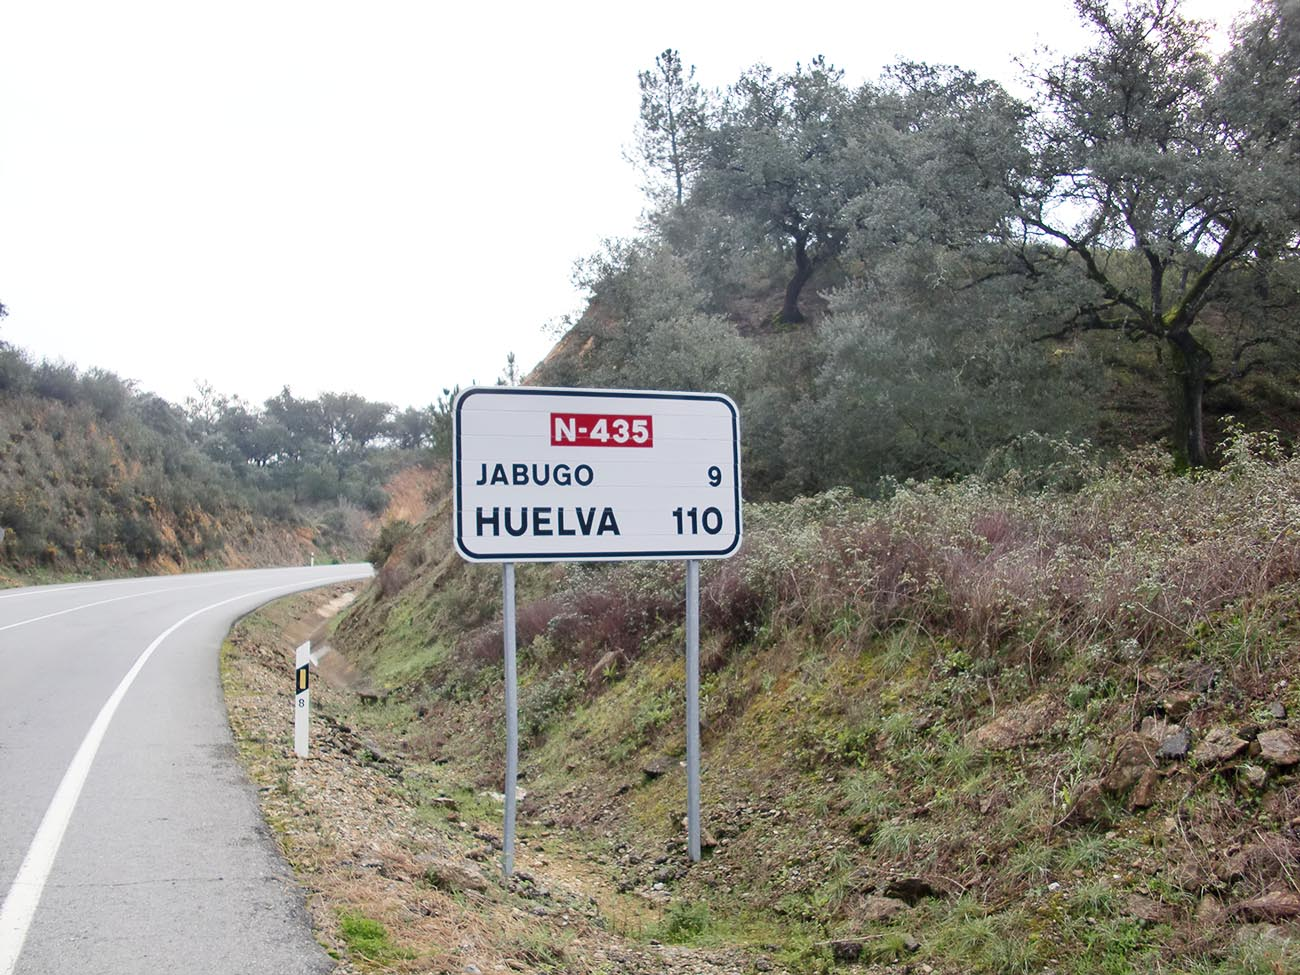 Province de Huelva, le Village de Jabugo